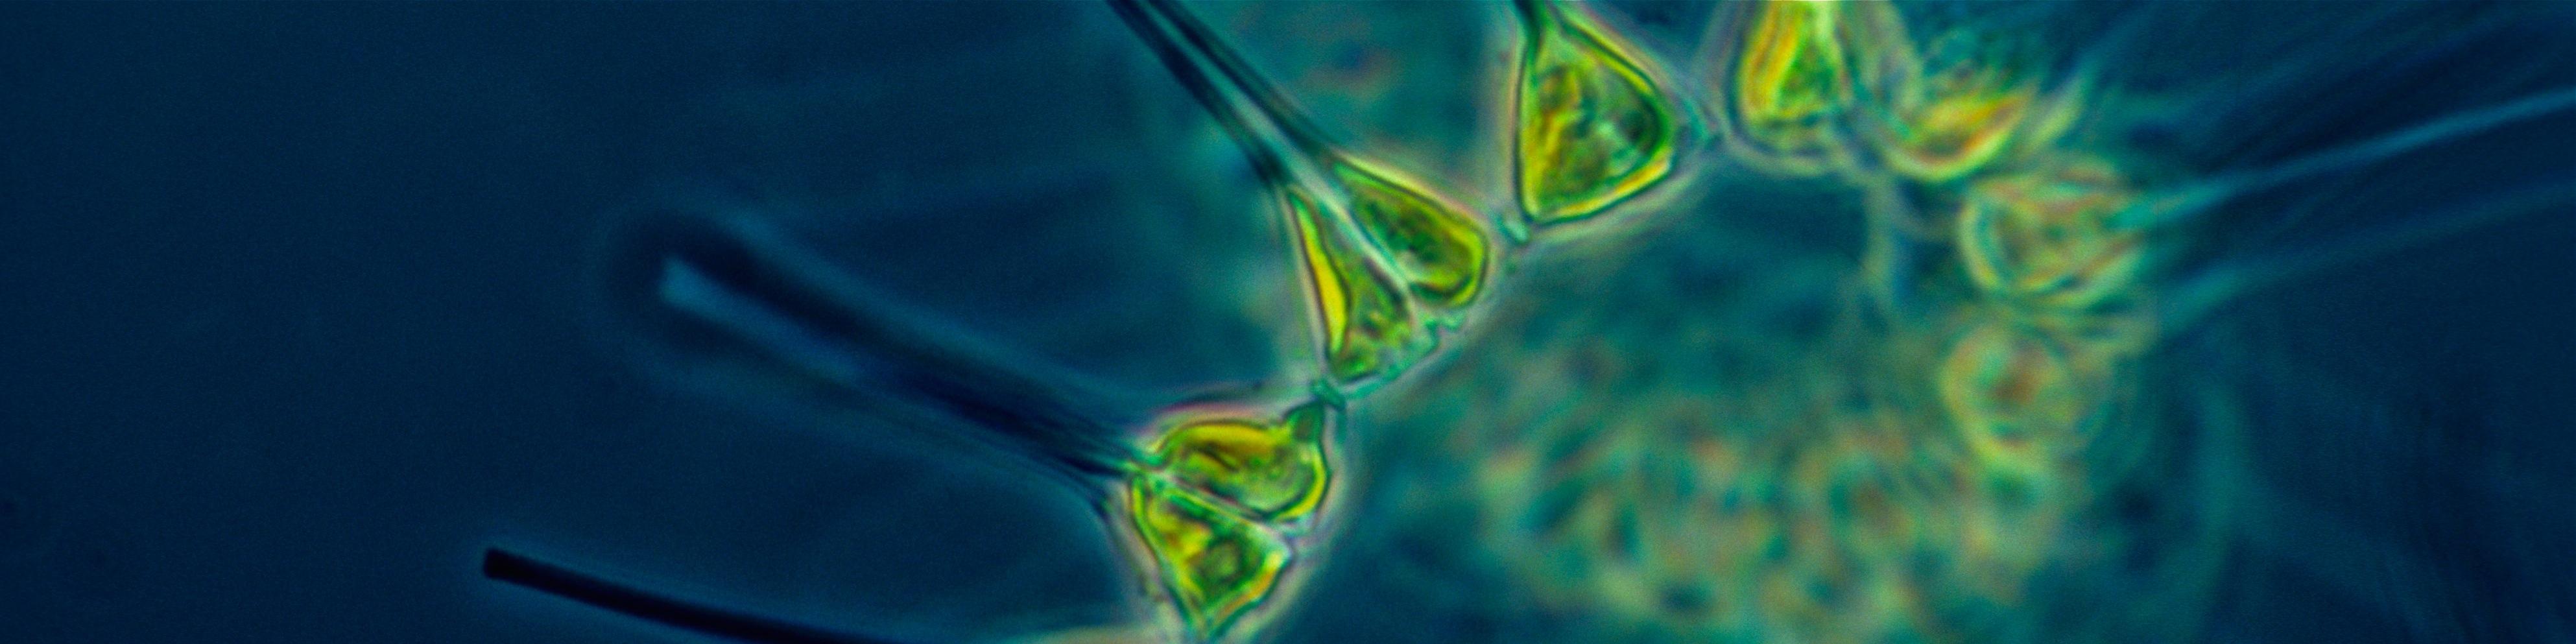 Ingredients-Slide-2-Phytoplankton